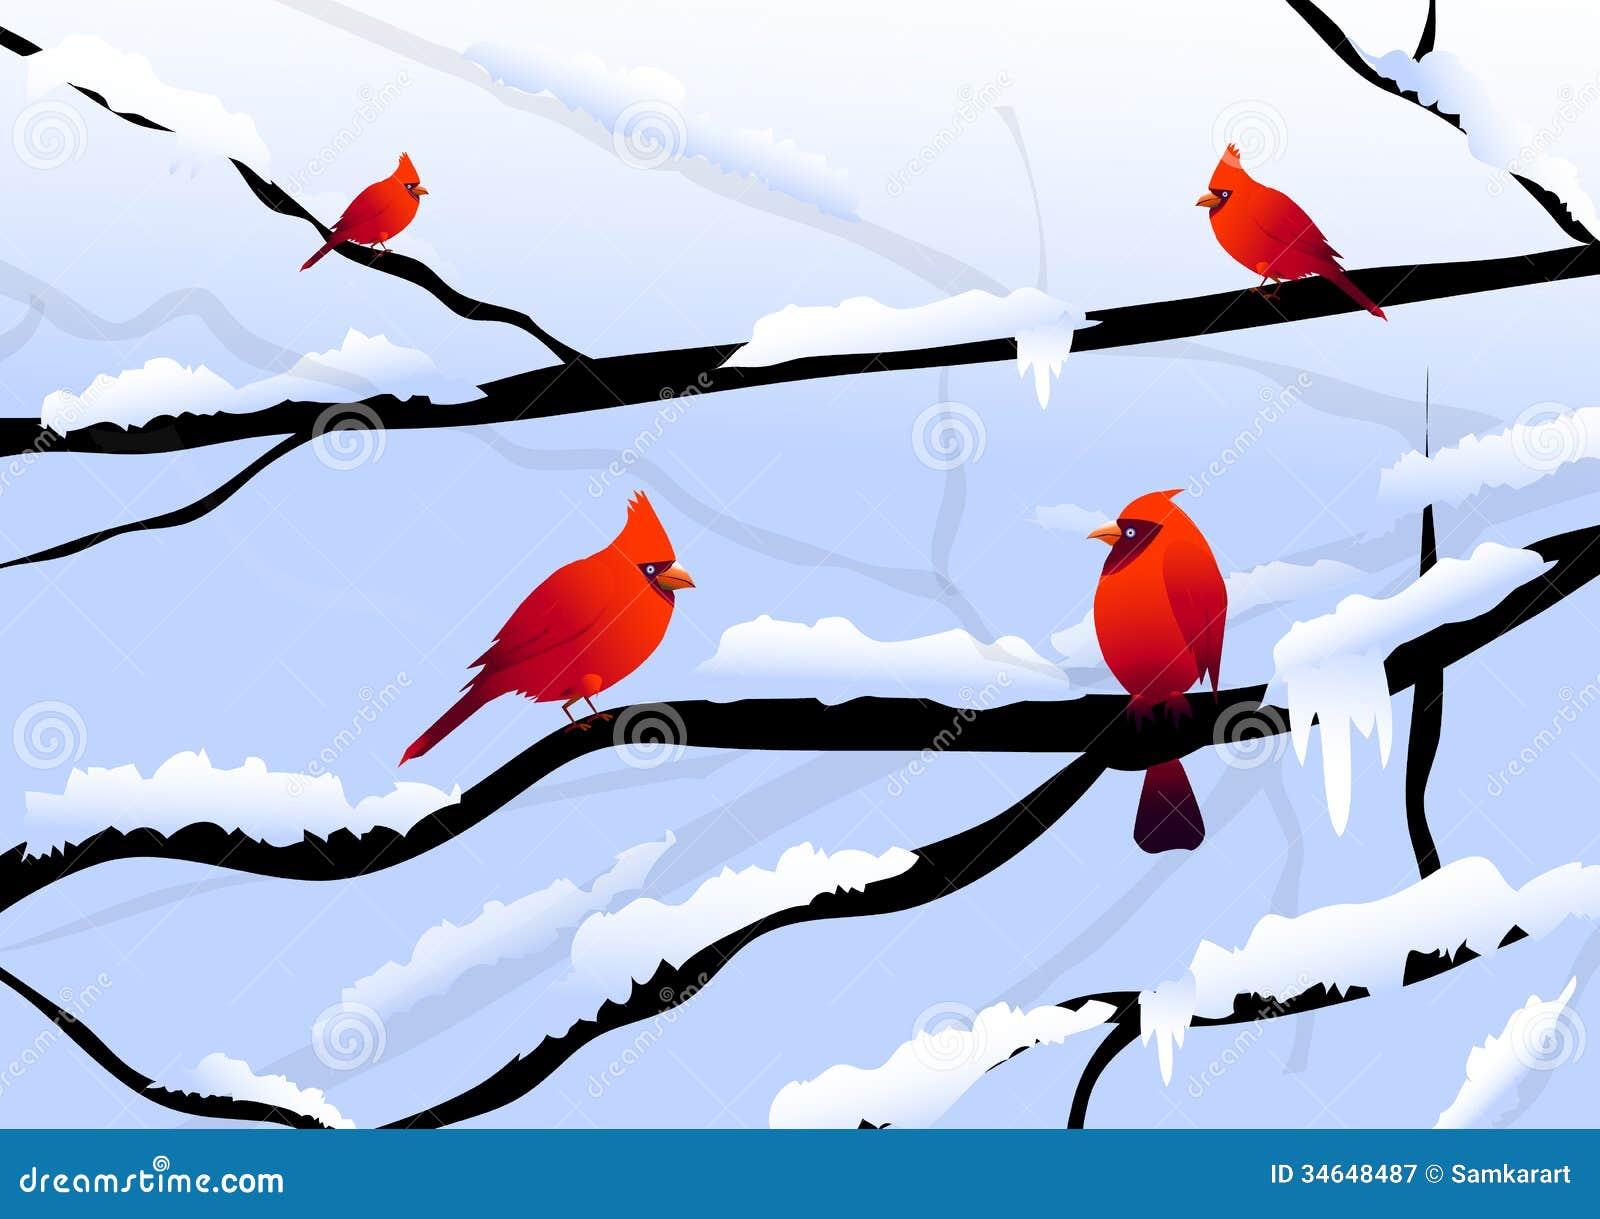 Modern xmas trees - Christmas Birds Amp Winter Landscape Royalty Free Stock Photography